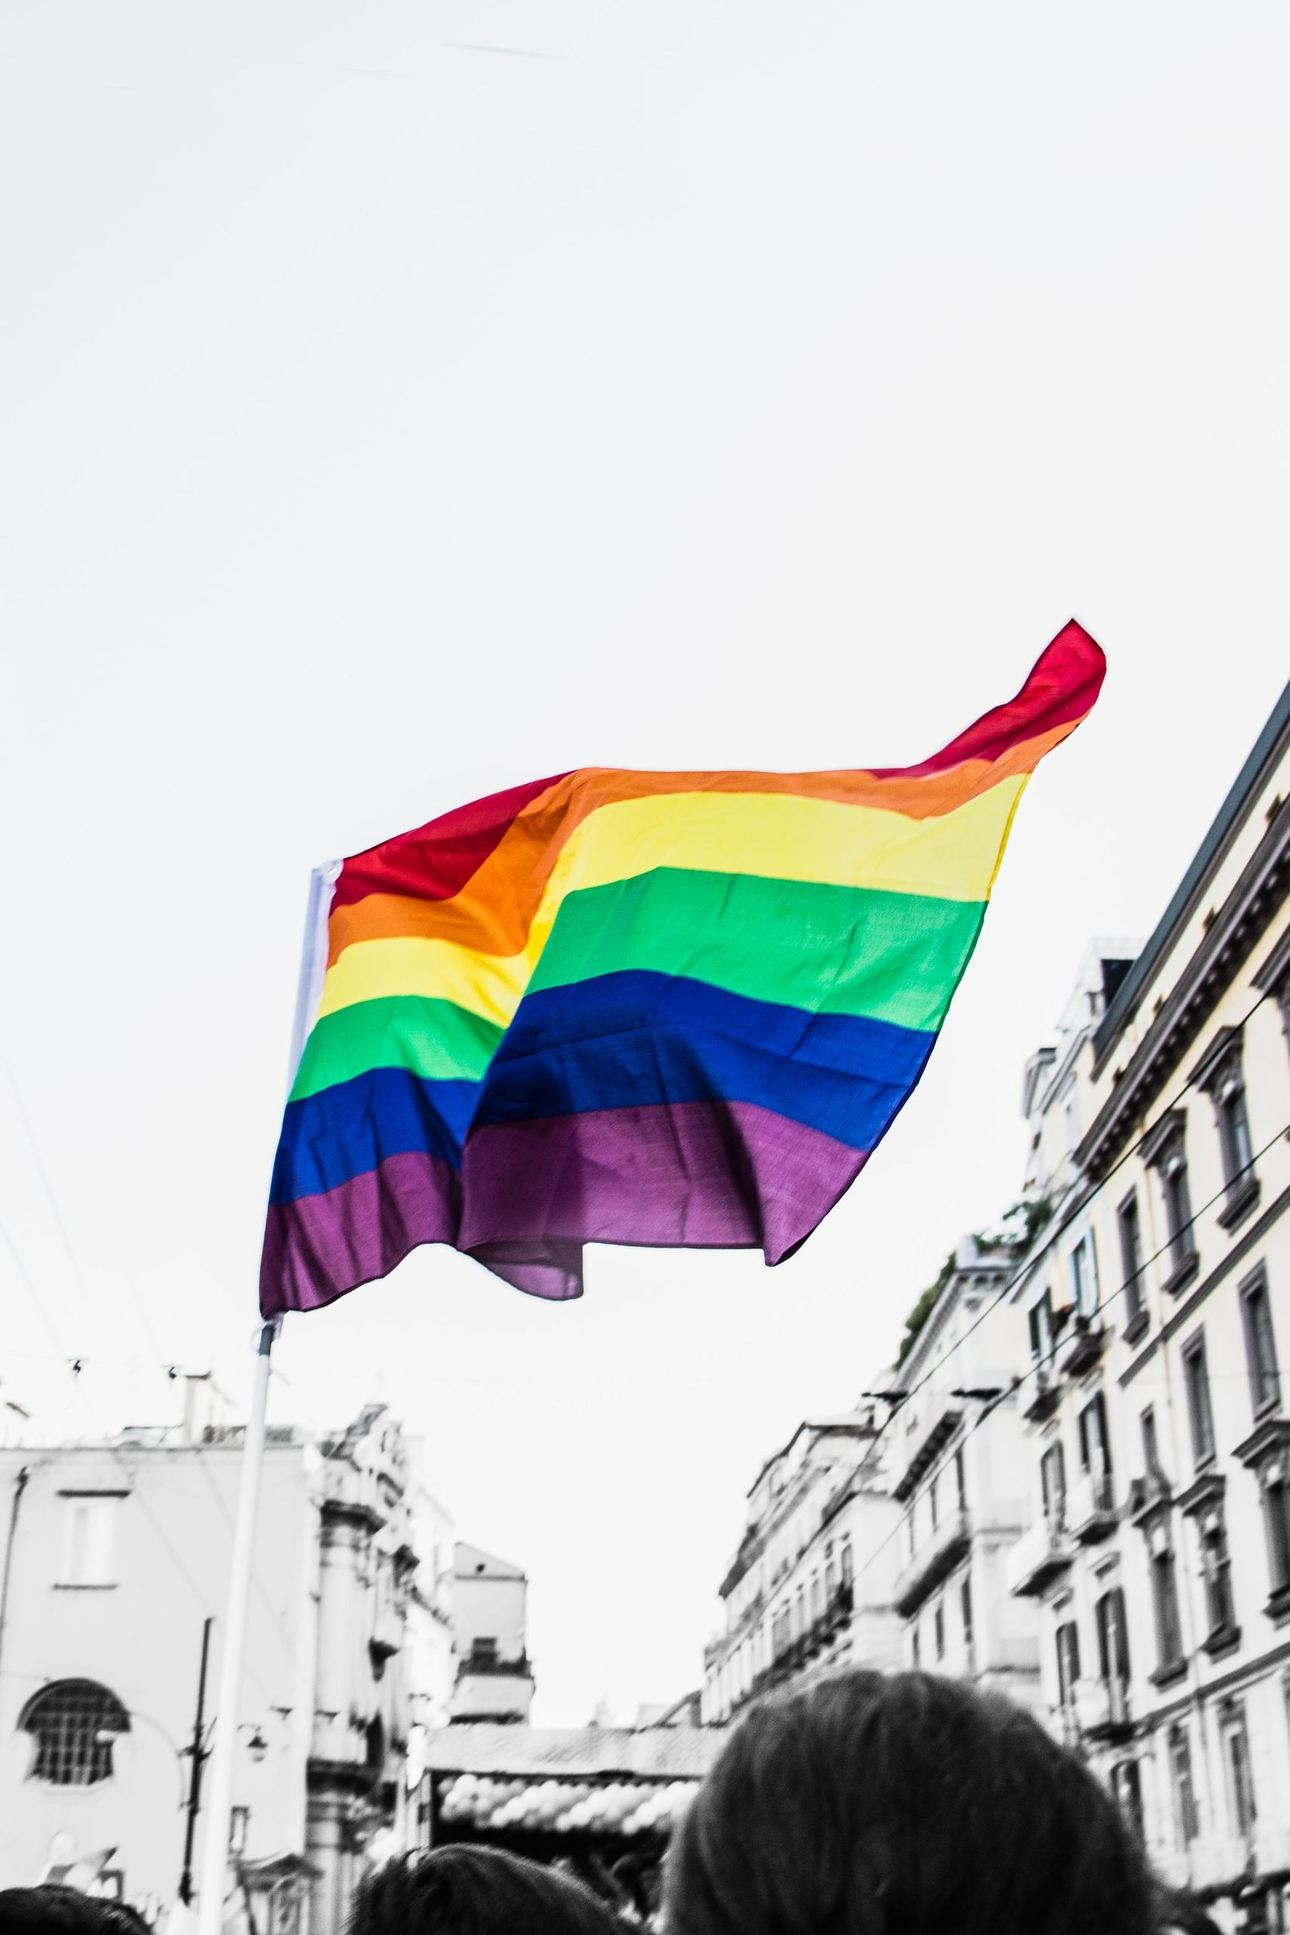 Assister à un mariage homosexuel